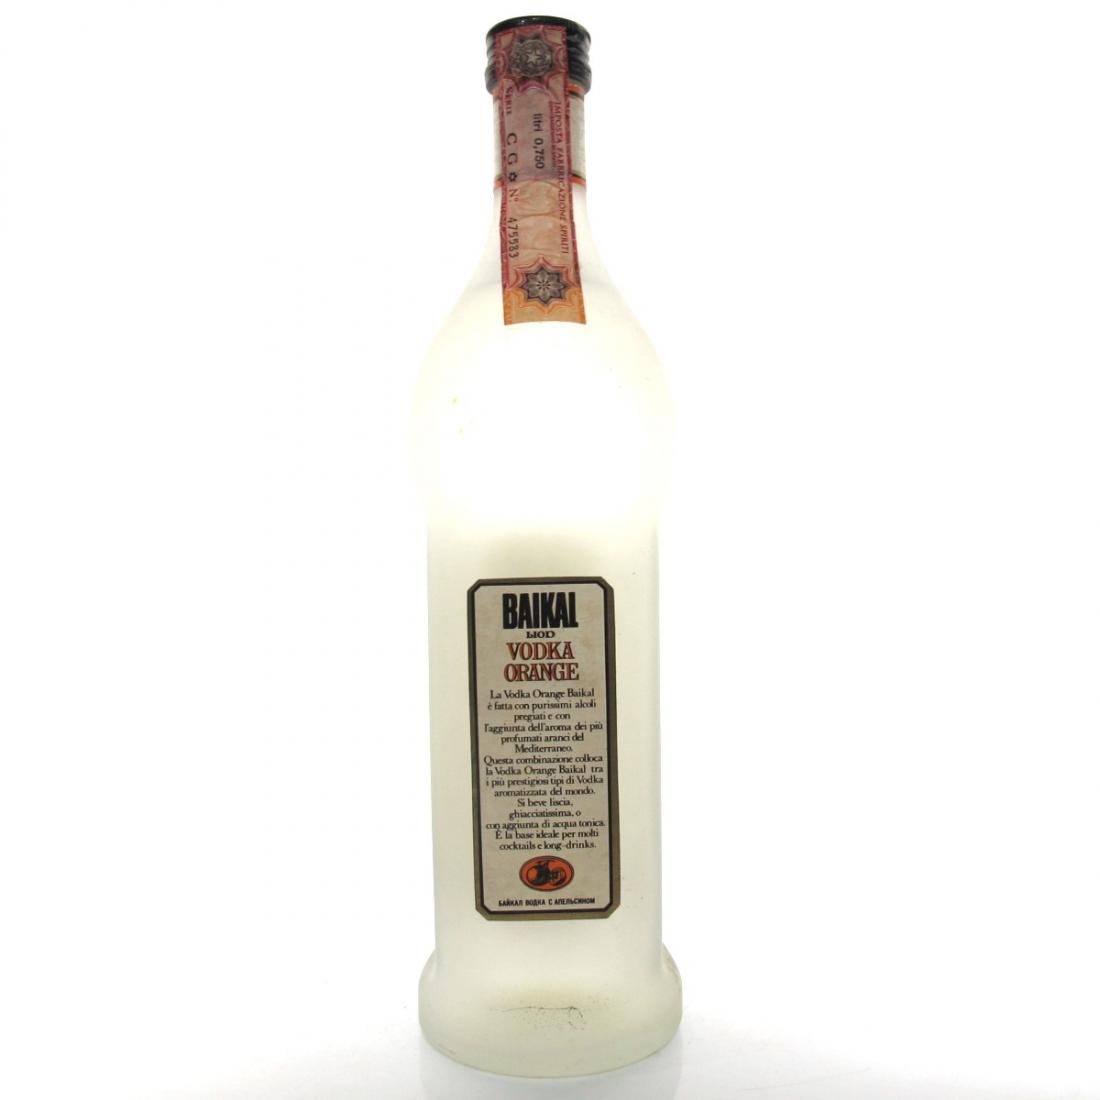 Baikal Liod Vodka Orange 1980s